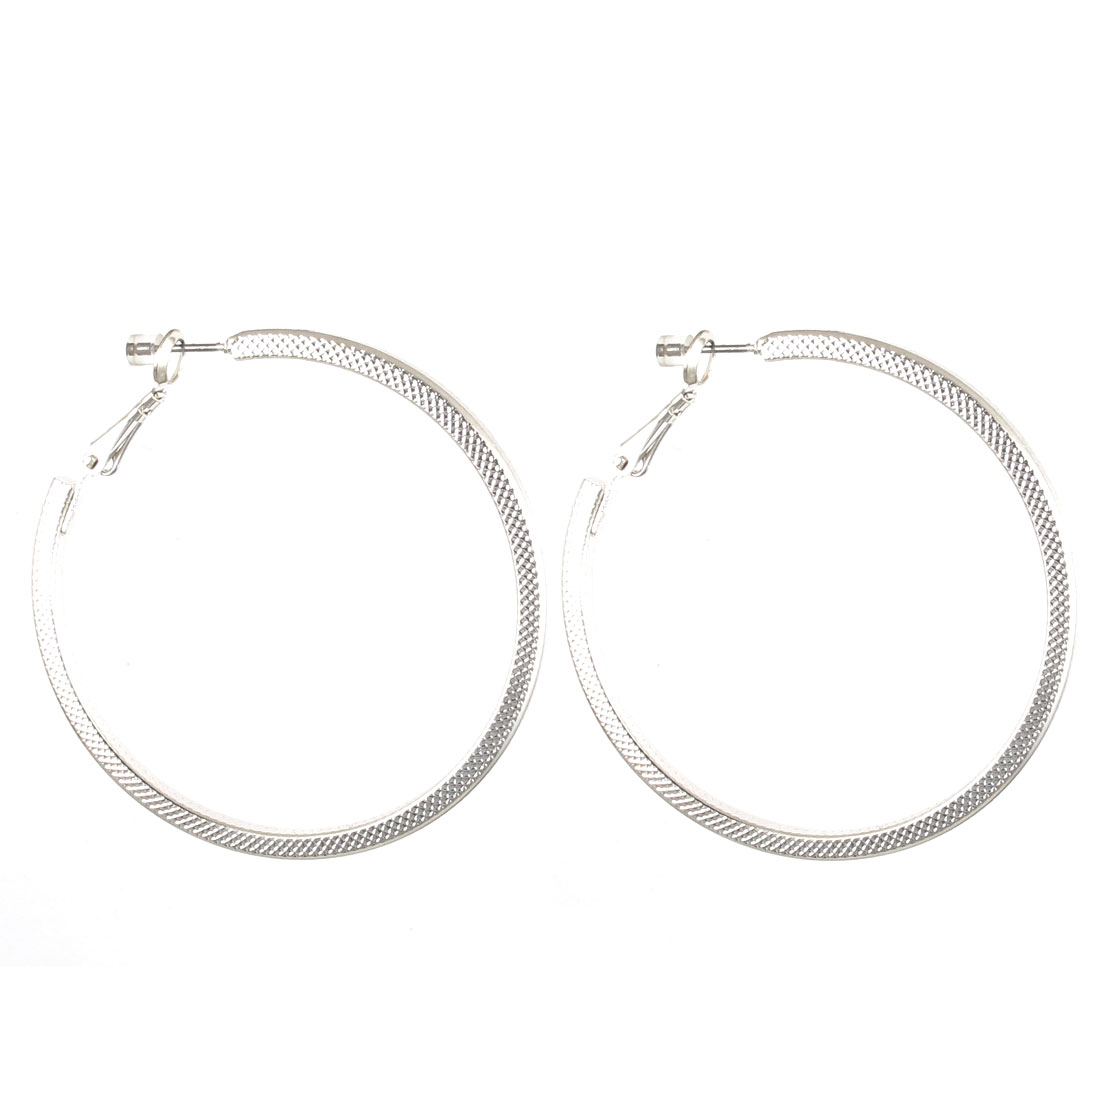 "2"" Dia Silver Tone Metal Edge Textured Circle Hoop Pierced Earrings Pair for Lady Women"